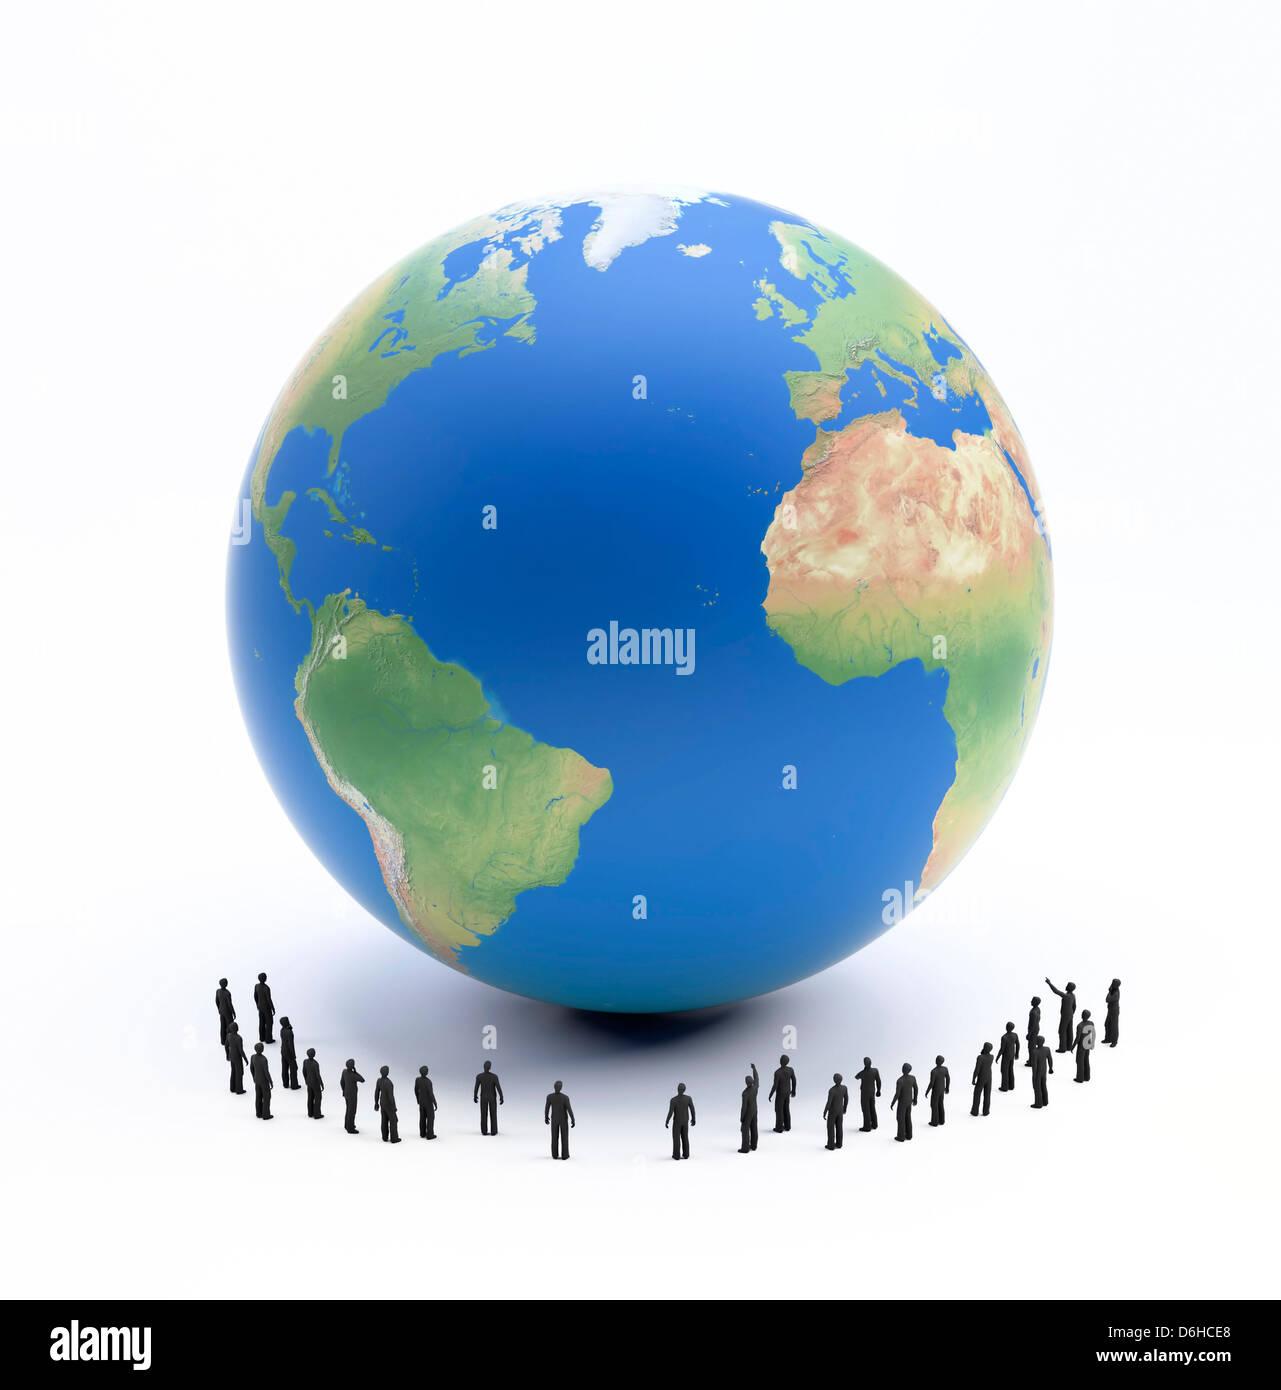 Global population, conceptual artwork - Stock Image